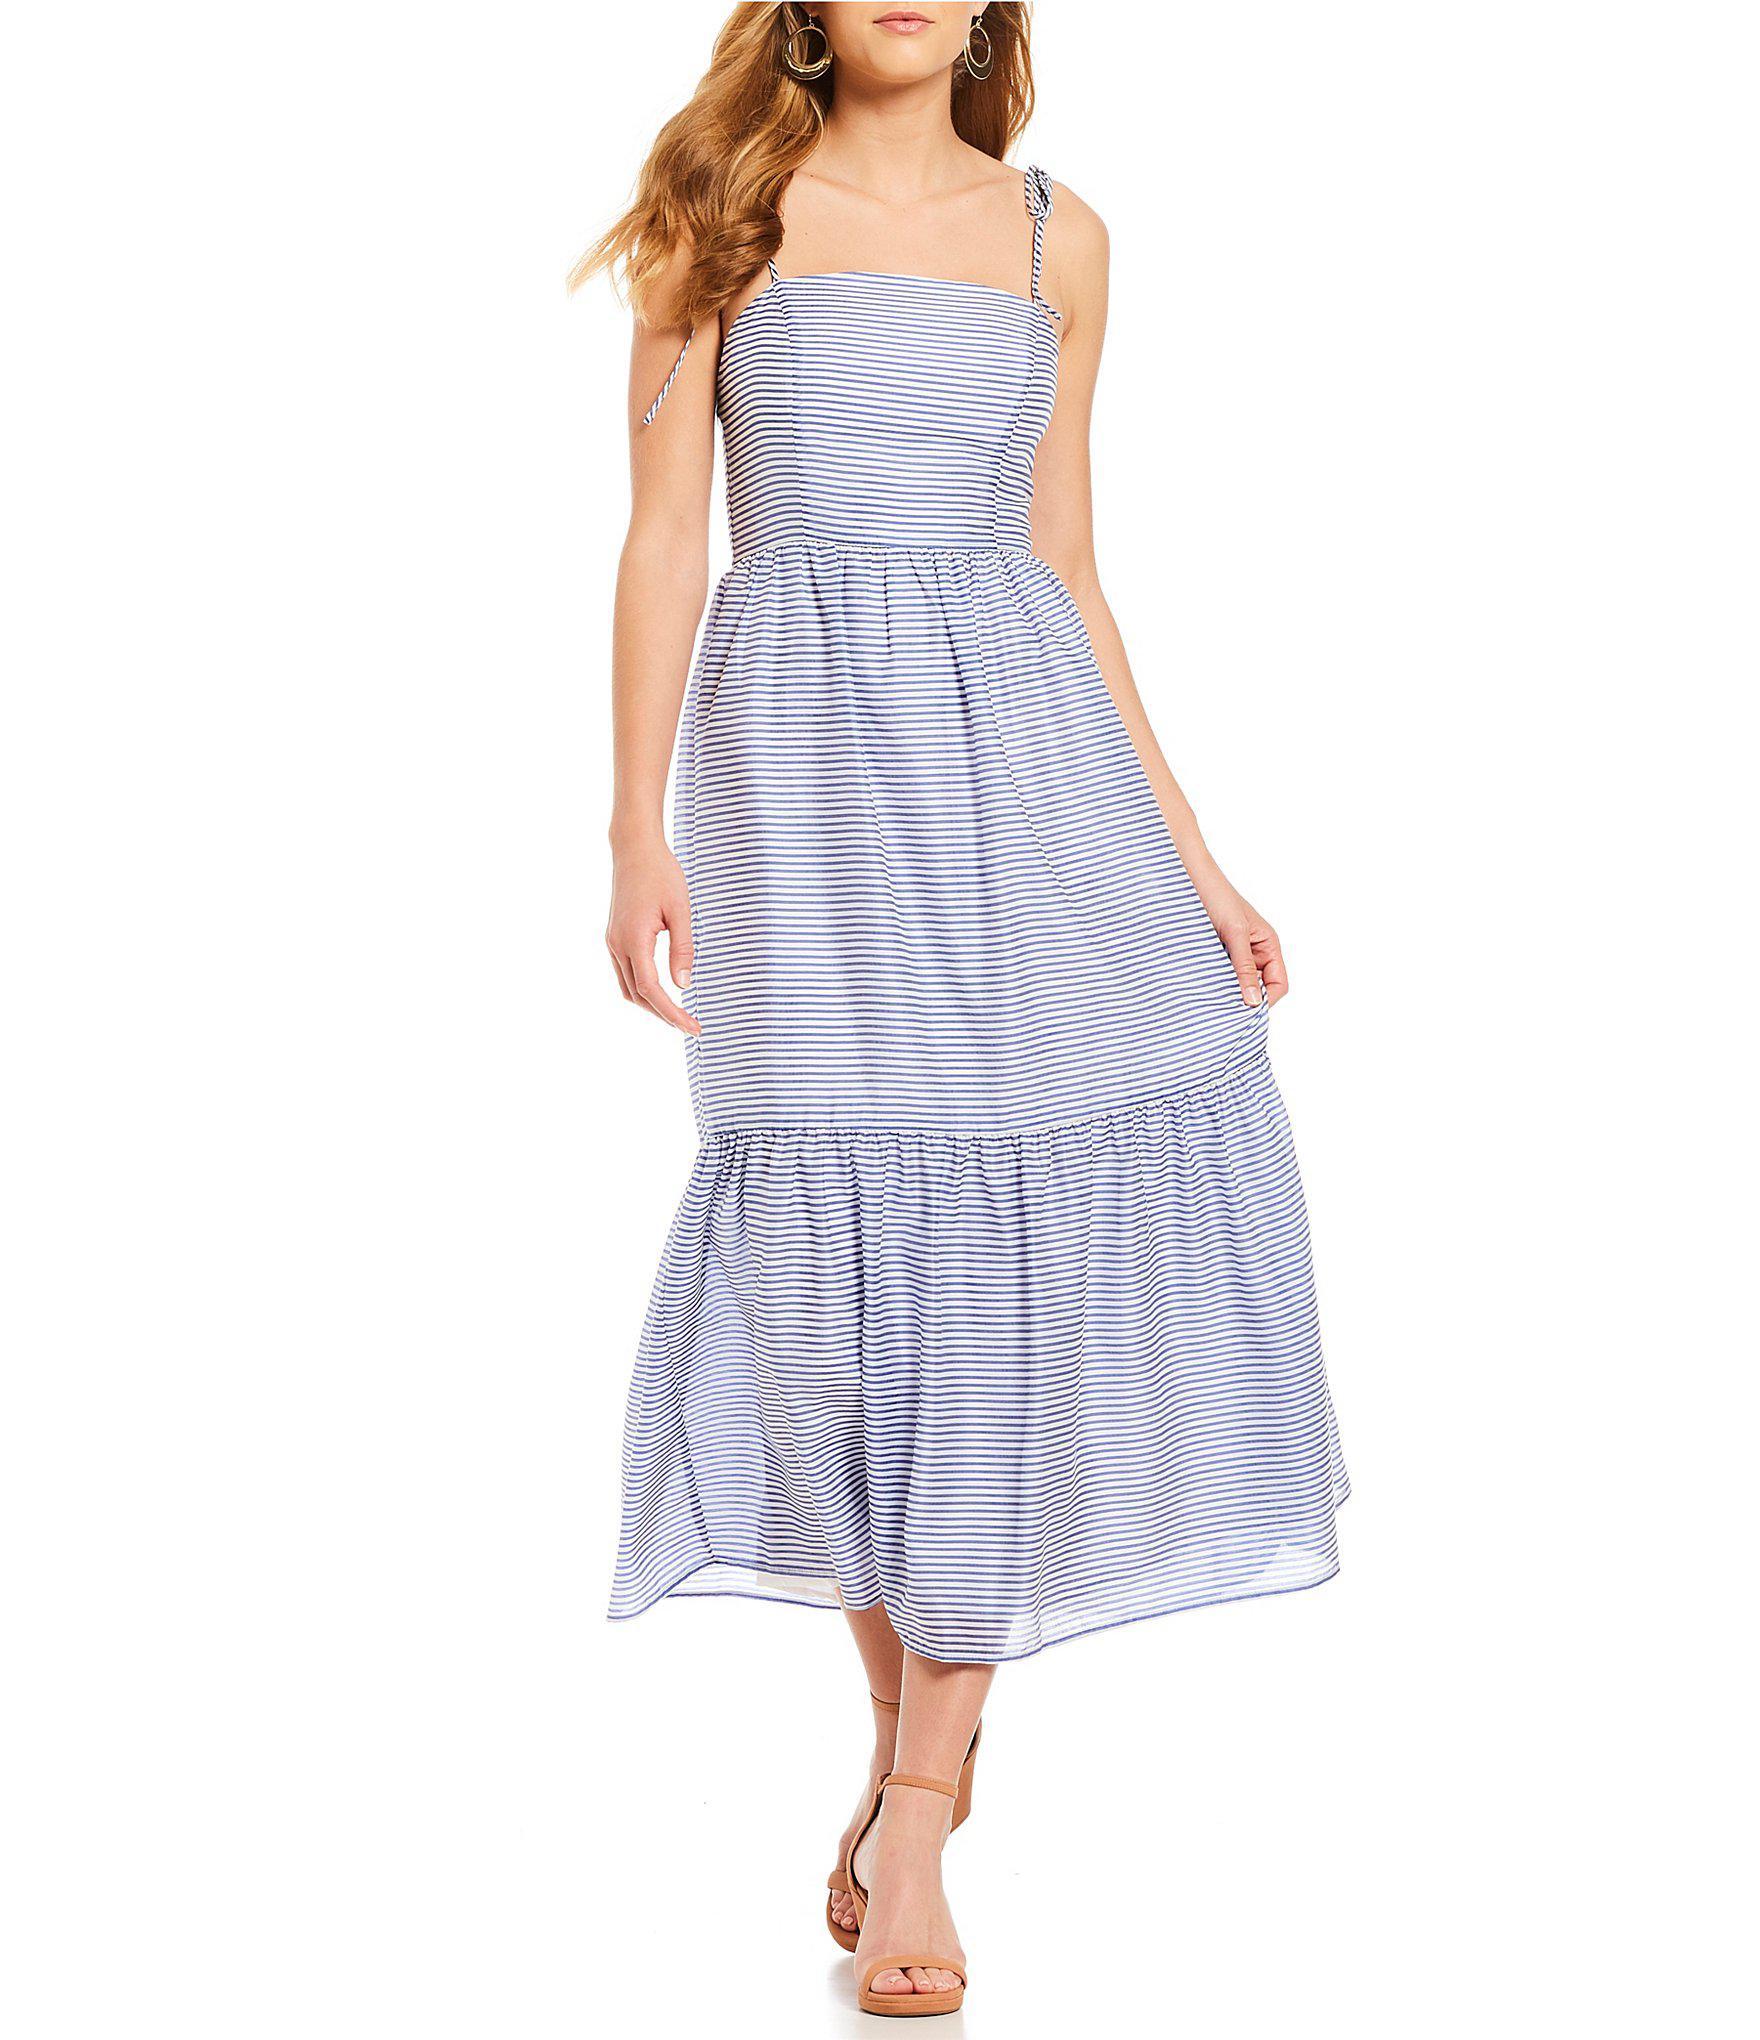 17c2f0702fe Gianni Bini Poppy Tie Strap Stripe Midi Dress in Blue - Lyst